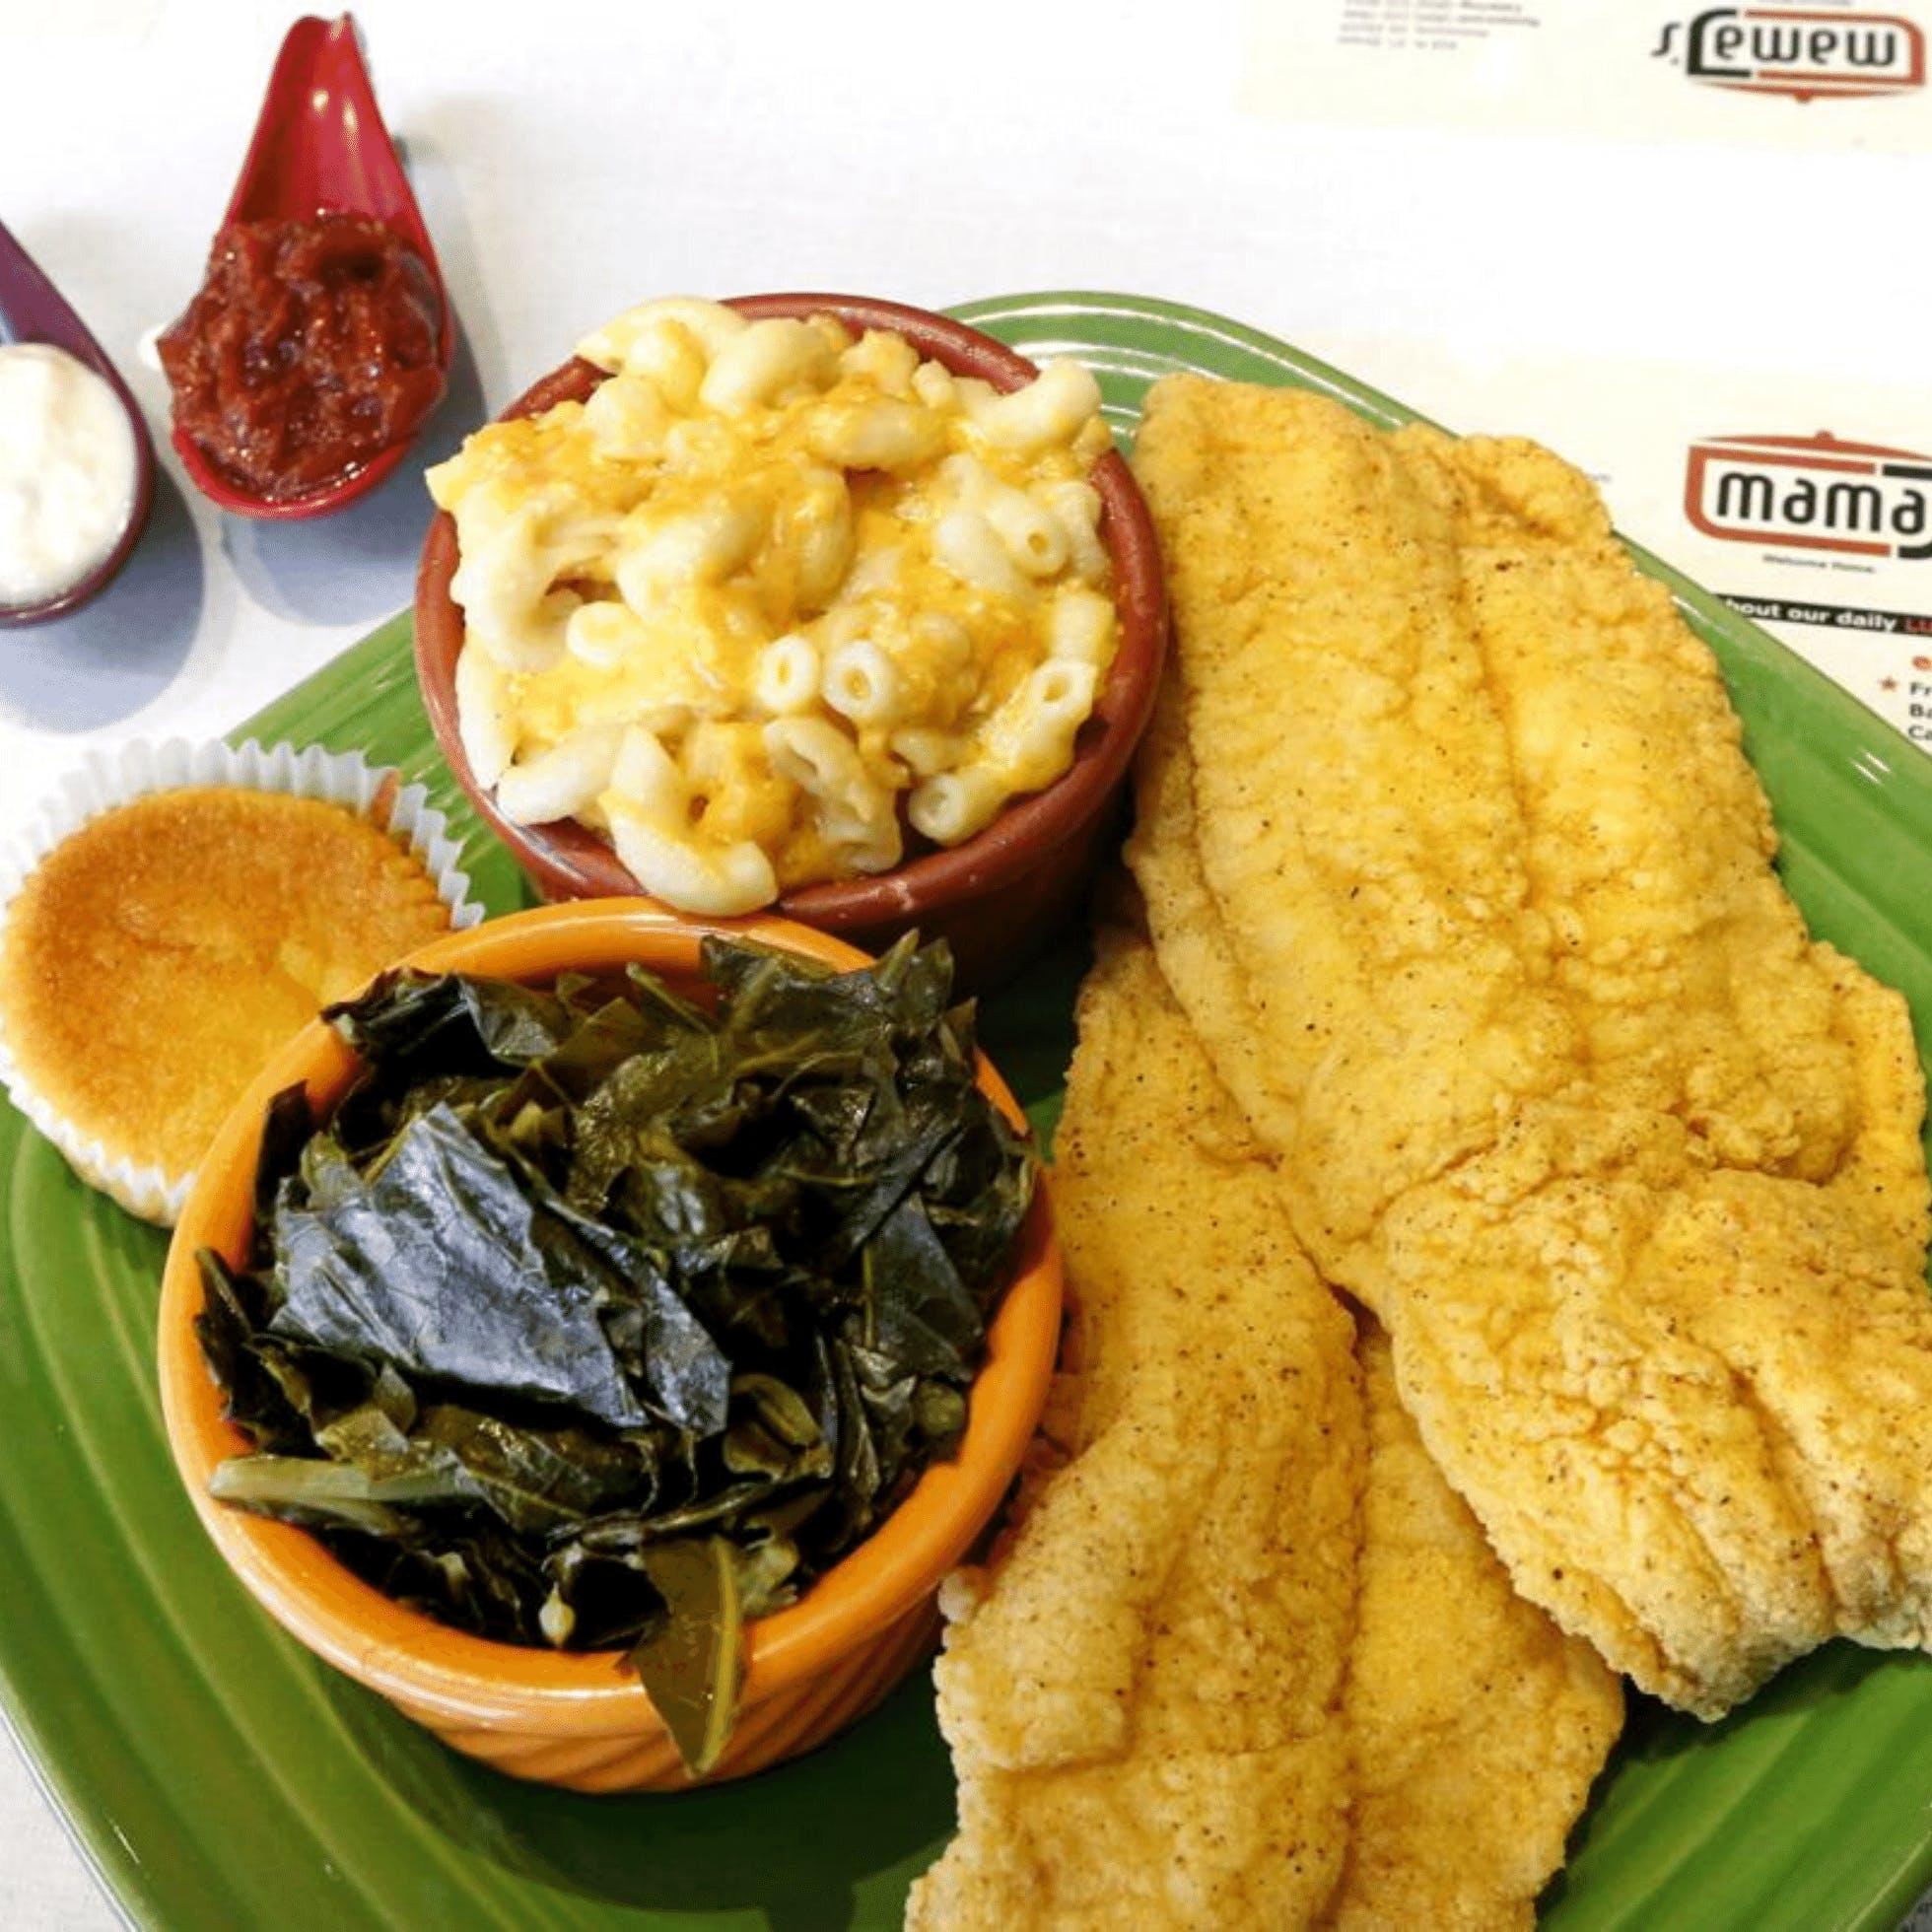 Mac and Cheese, Cornbread muffin, fried fish, and collard greens from Mama J's in Richmond VA